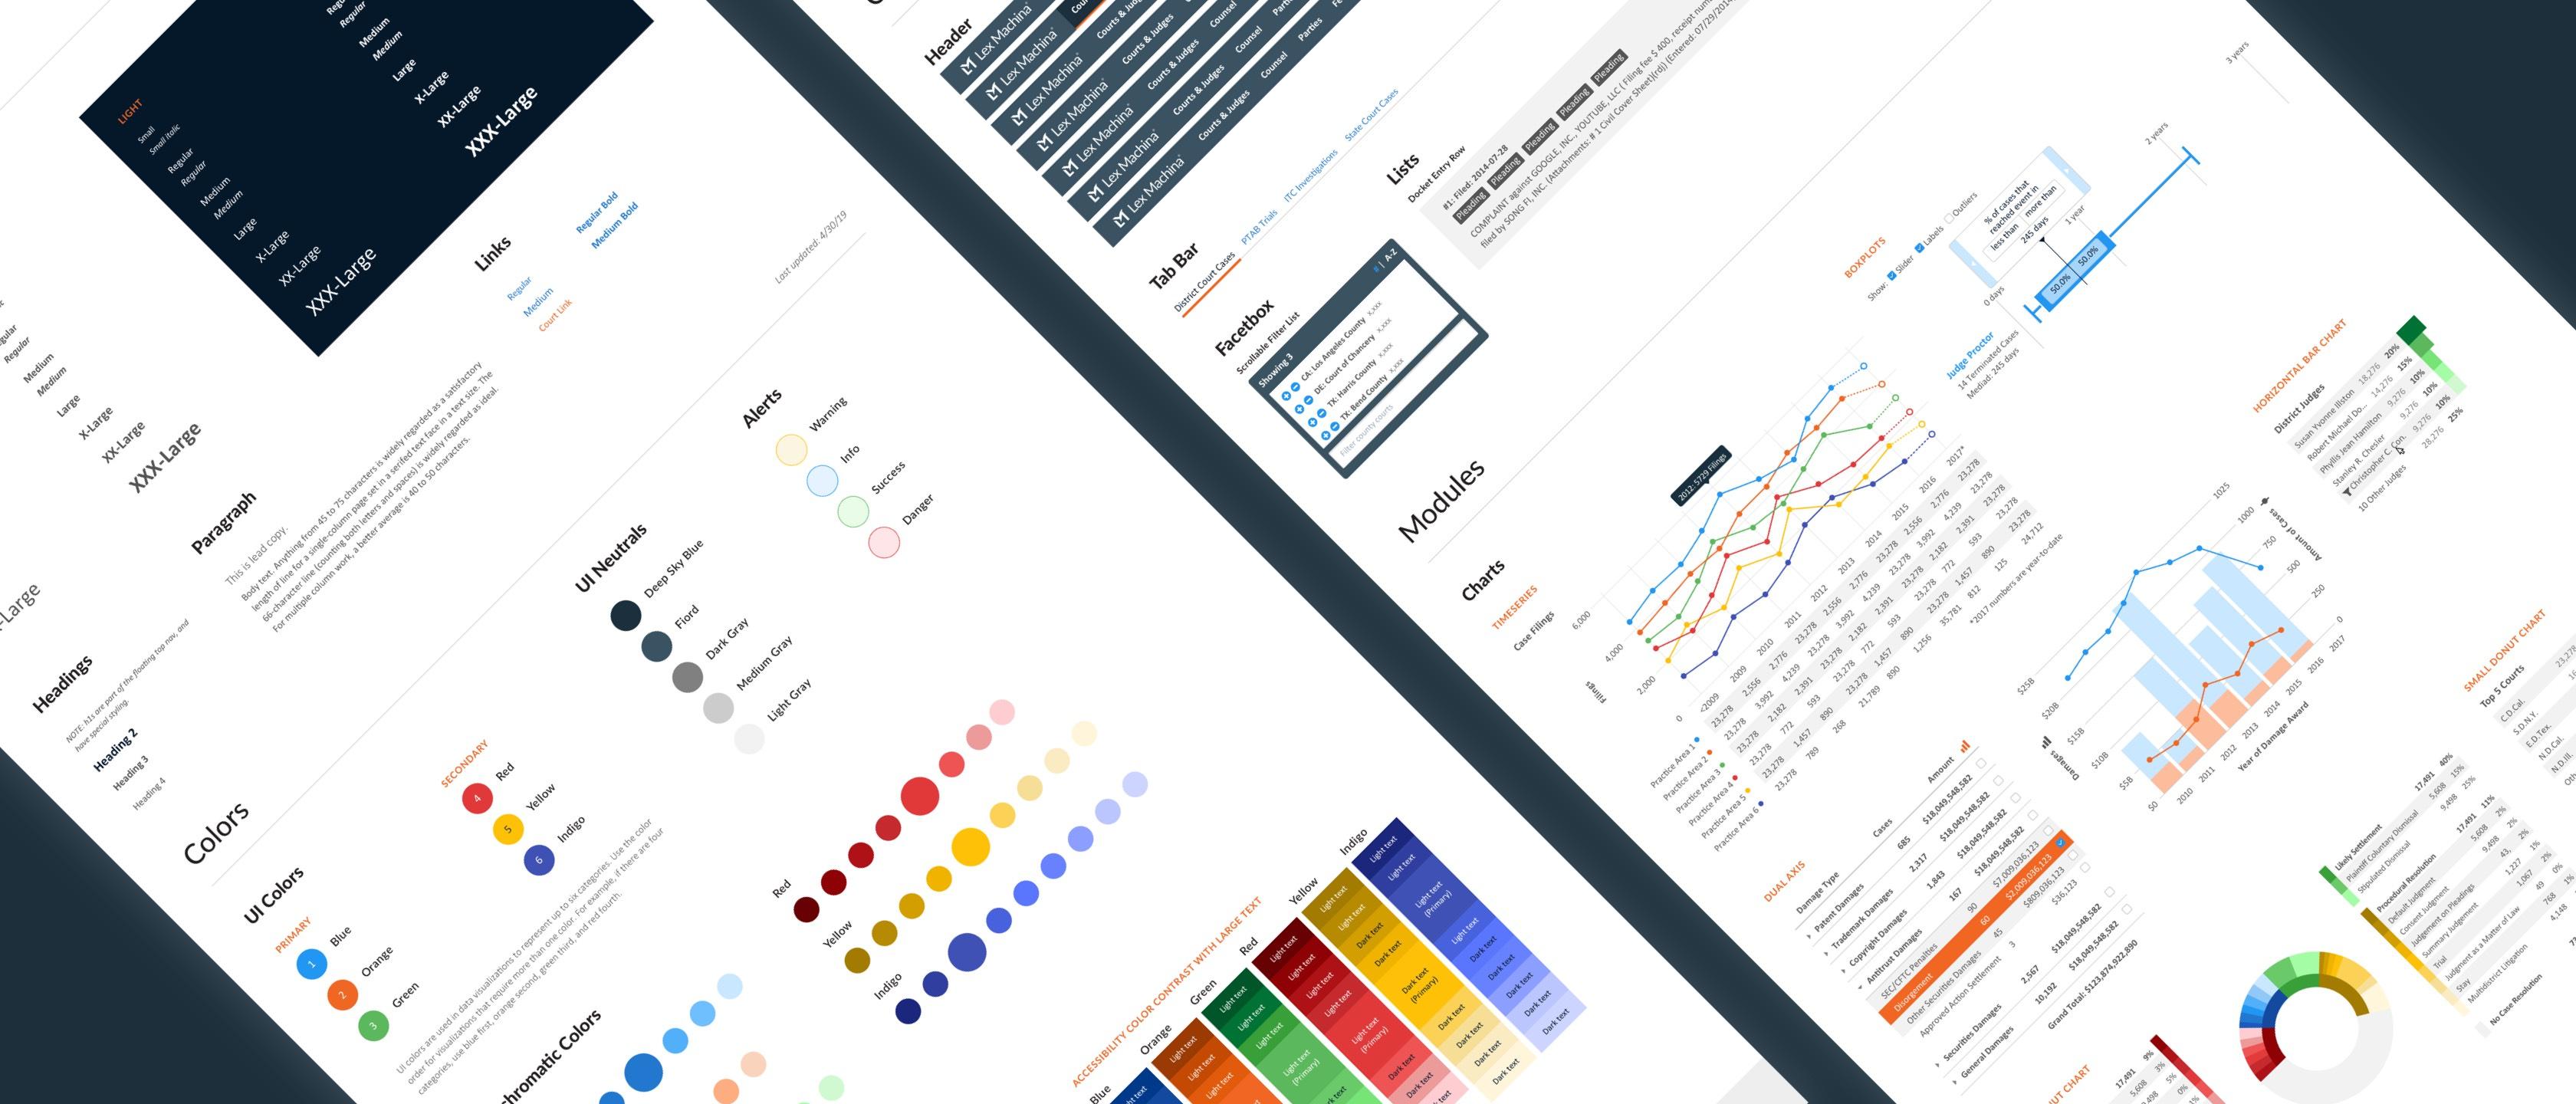 Lex Machina Visual System